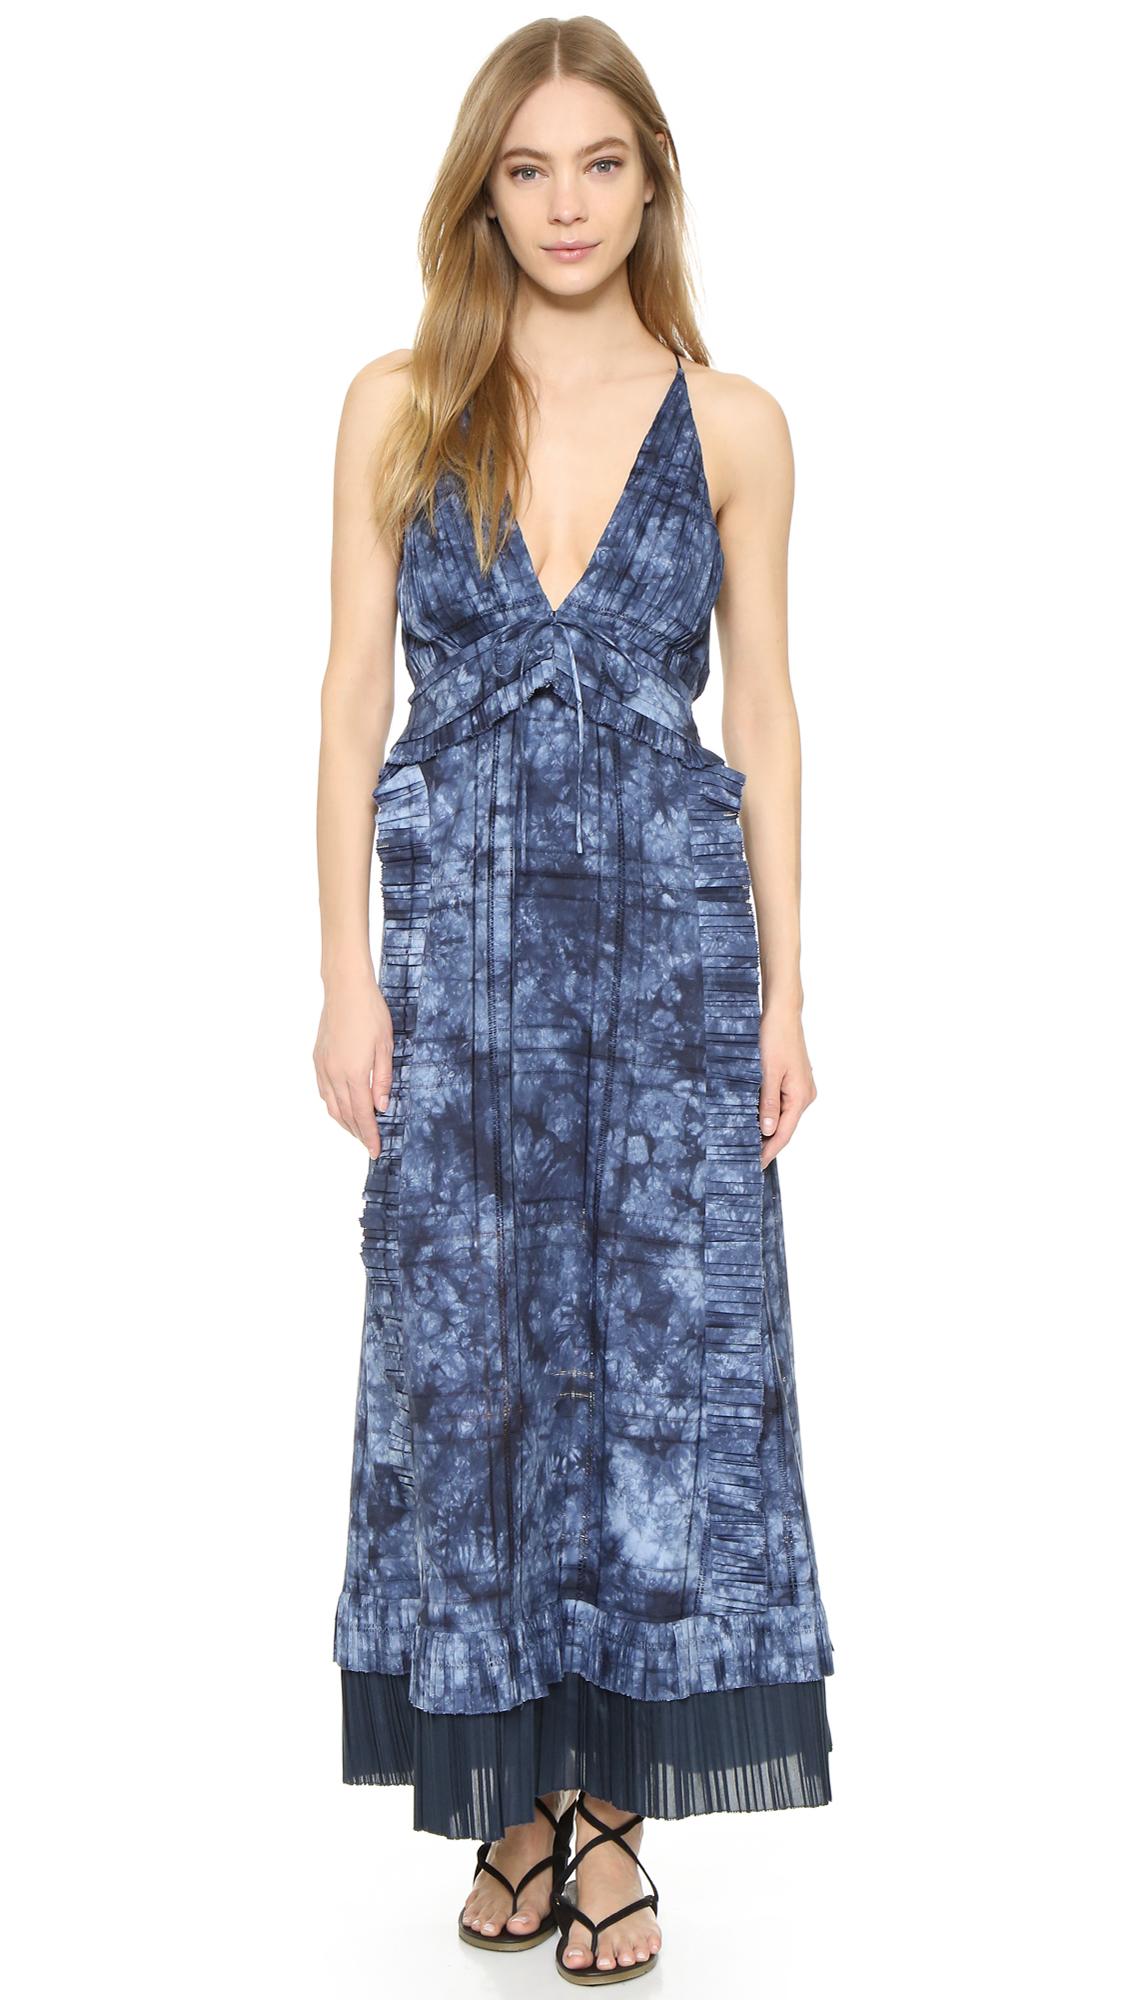 Thakoon Ruffle Front Long Dress - Indigo at Shopbop